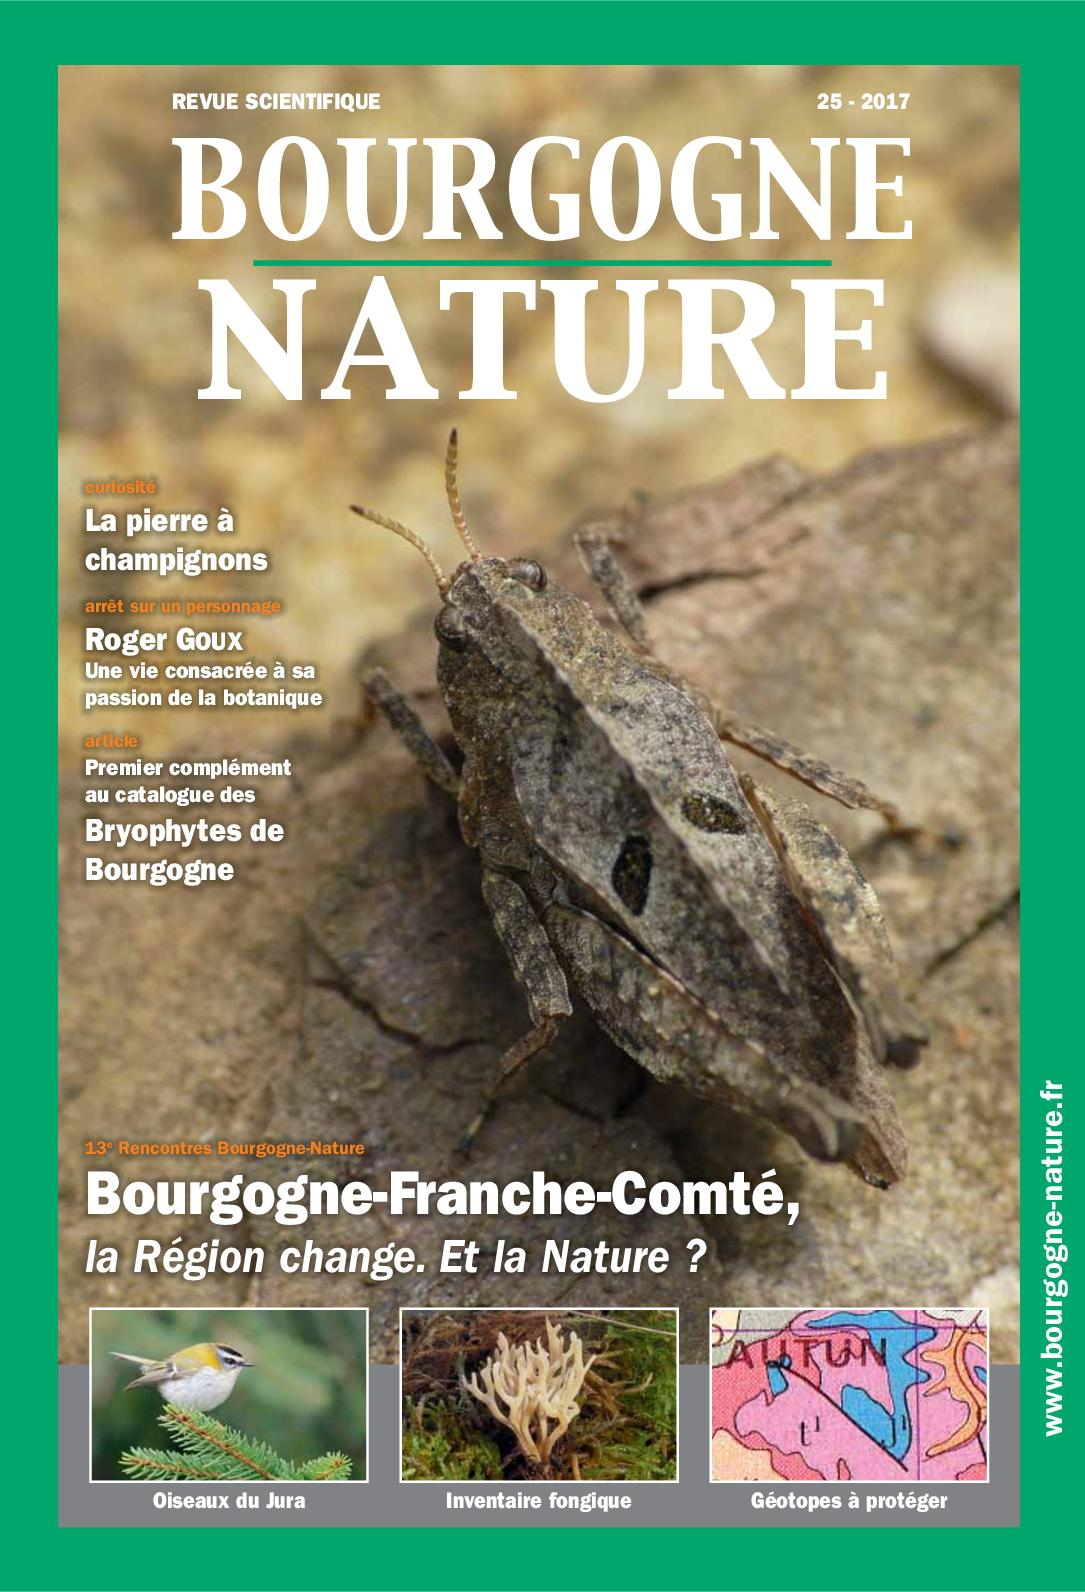 Bourgogne Nature N°25 Calaméo Bourgogne Calaméo gyvf6Yb7